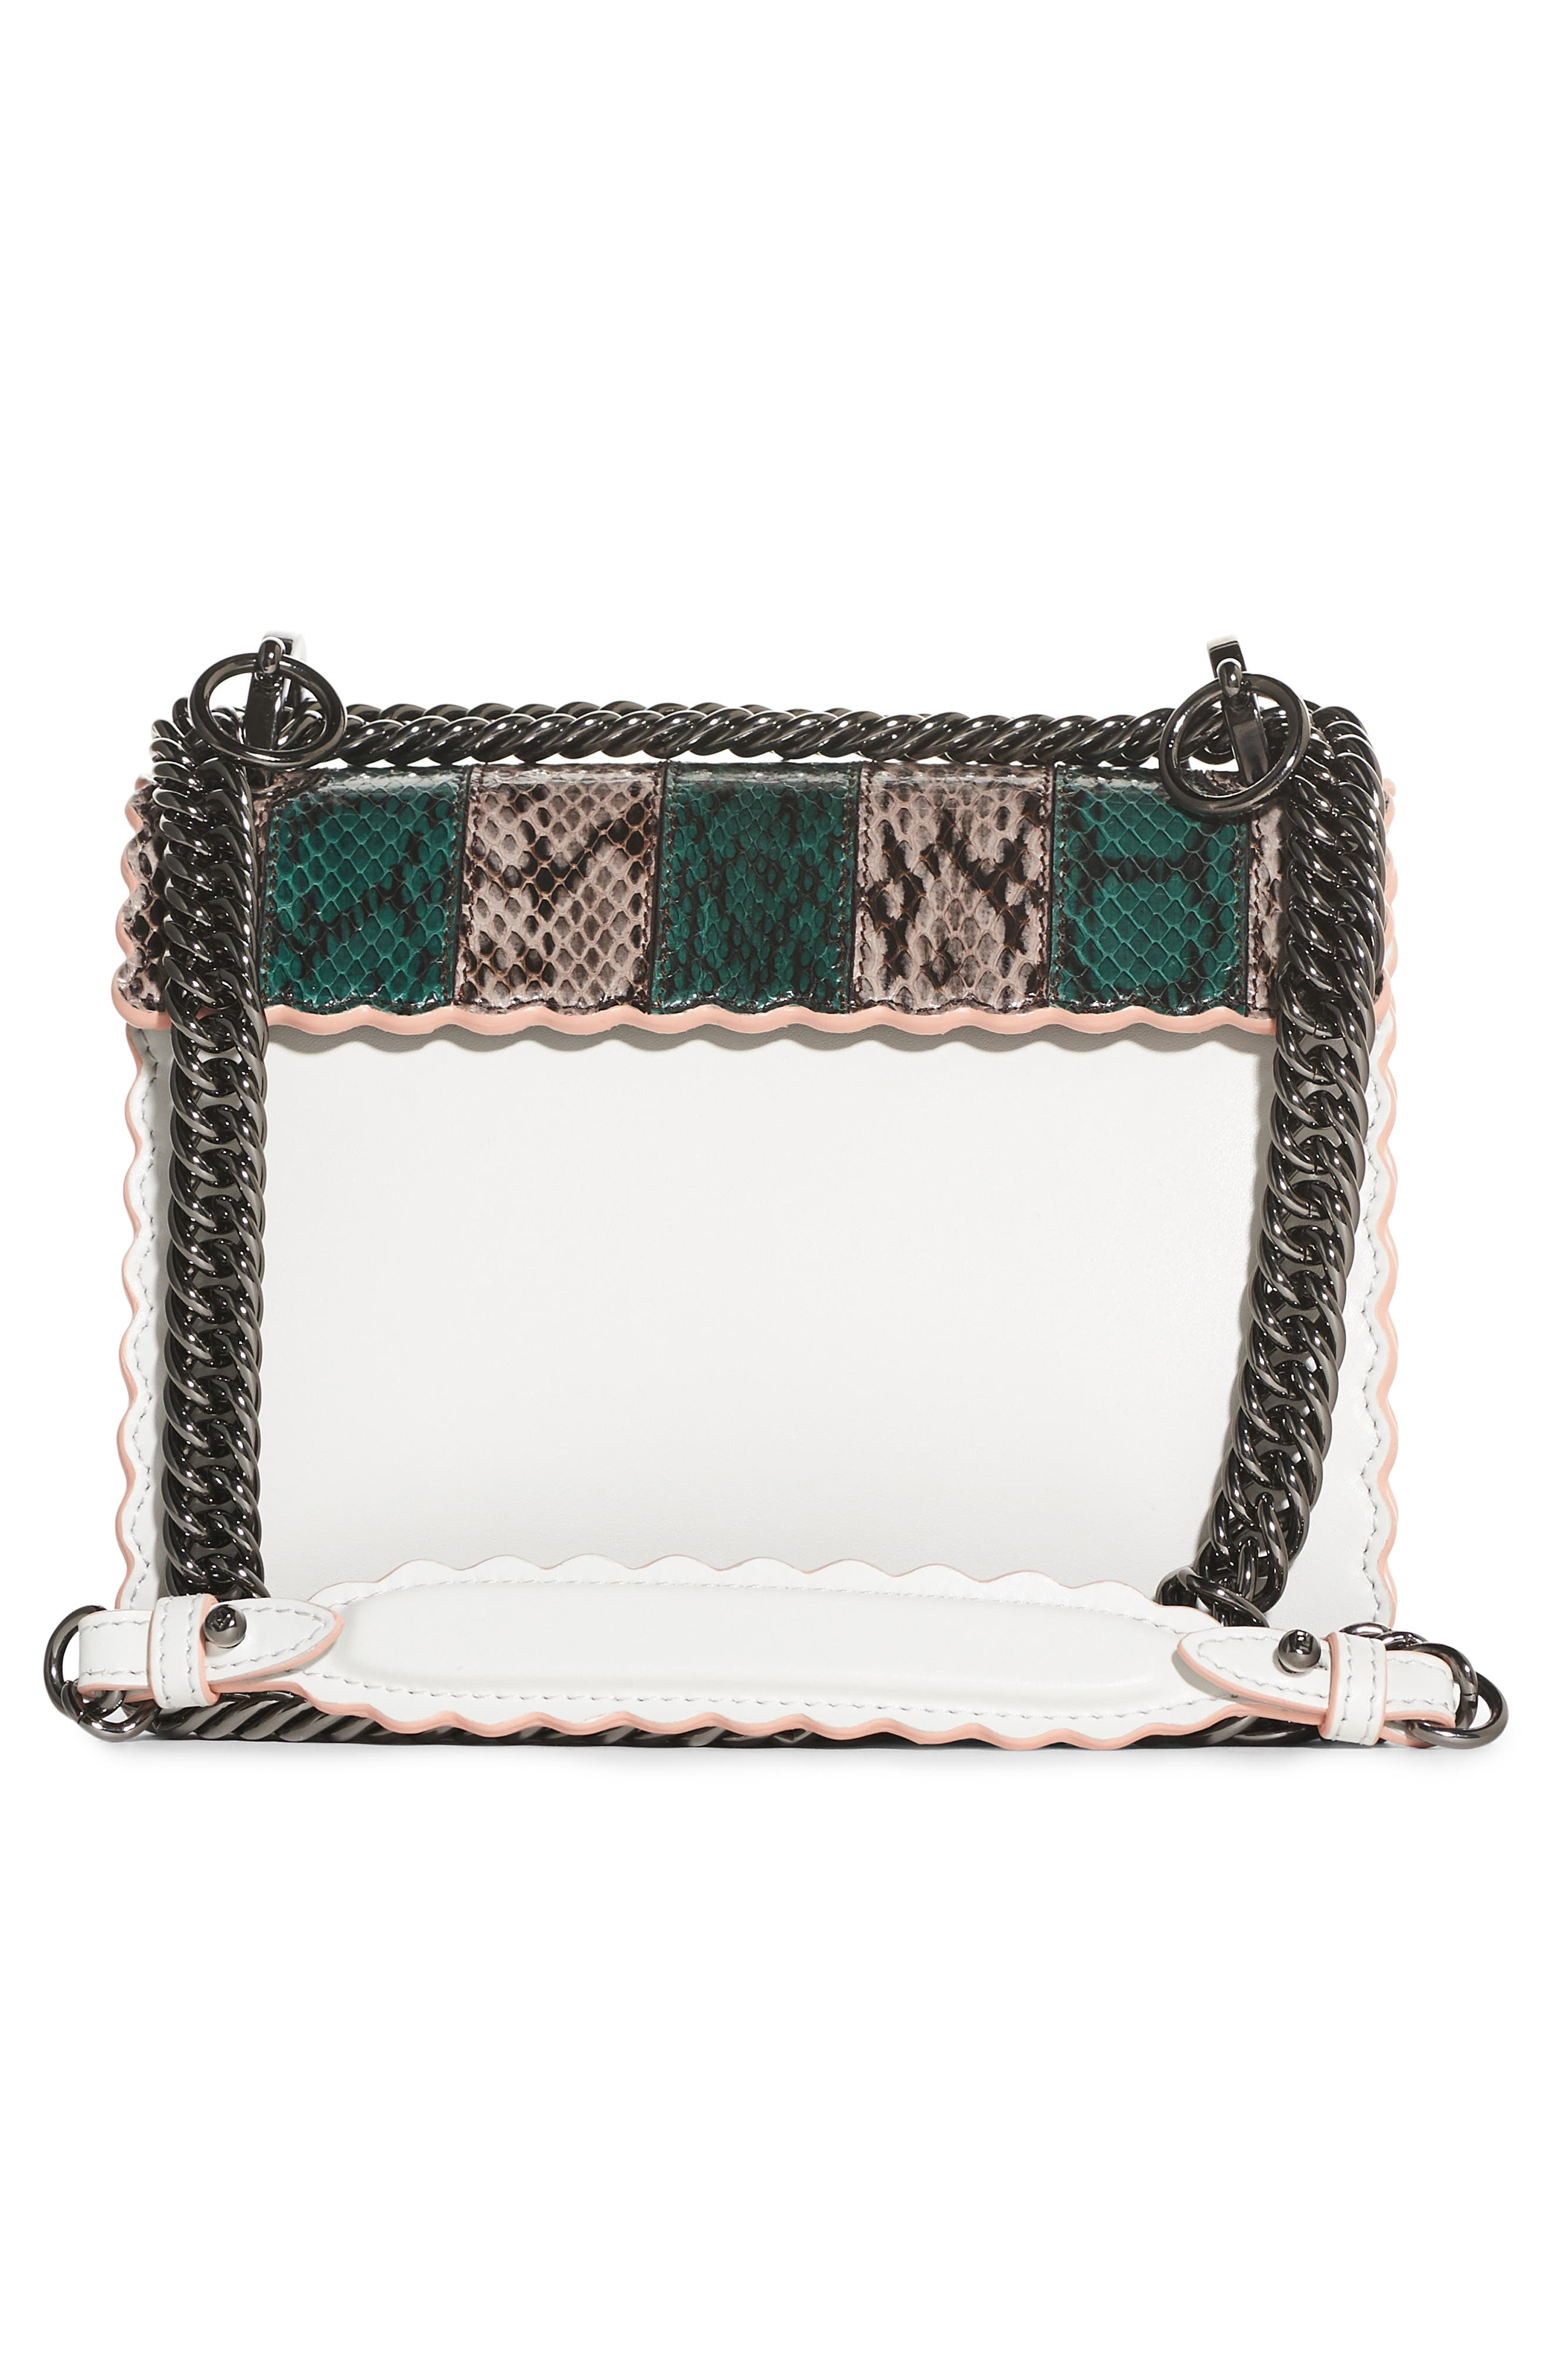 Mini Kan Scallop Genuine Snakeskin & Leather Shoulder Bag,                             Alternate thumbnail 2, color,                             TAUPE/ROMARO/WHITE